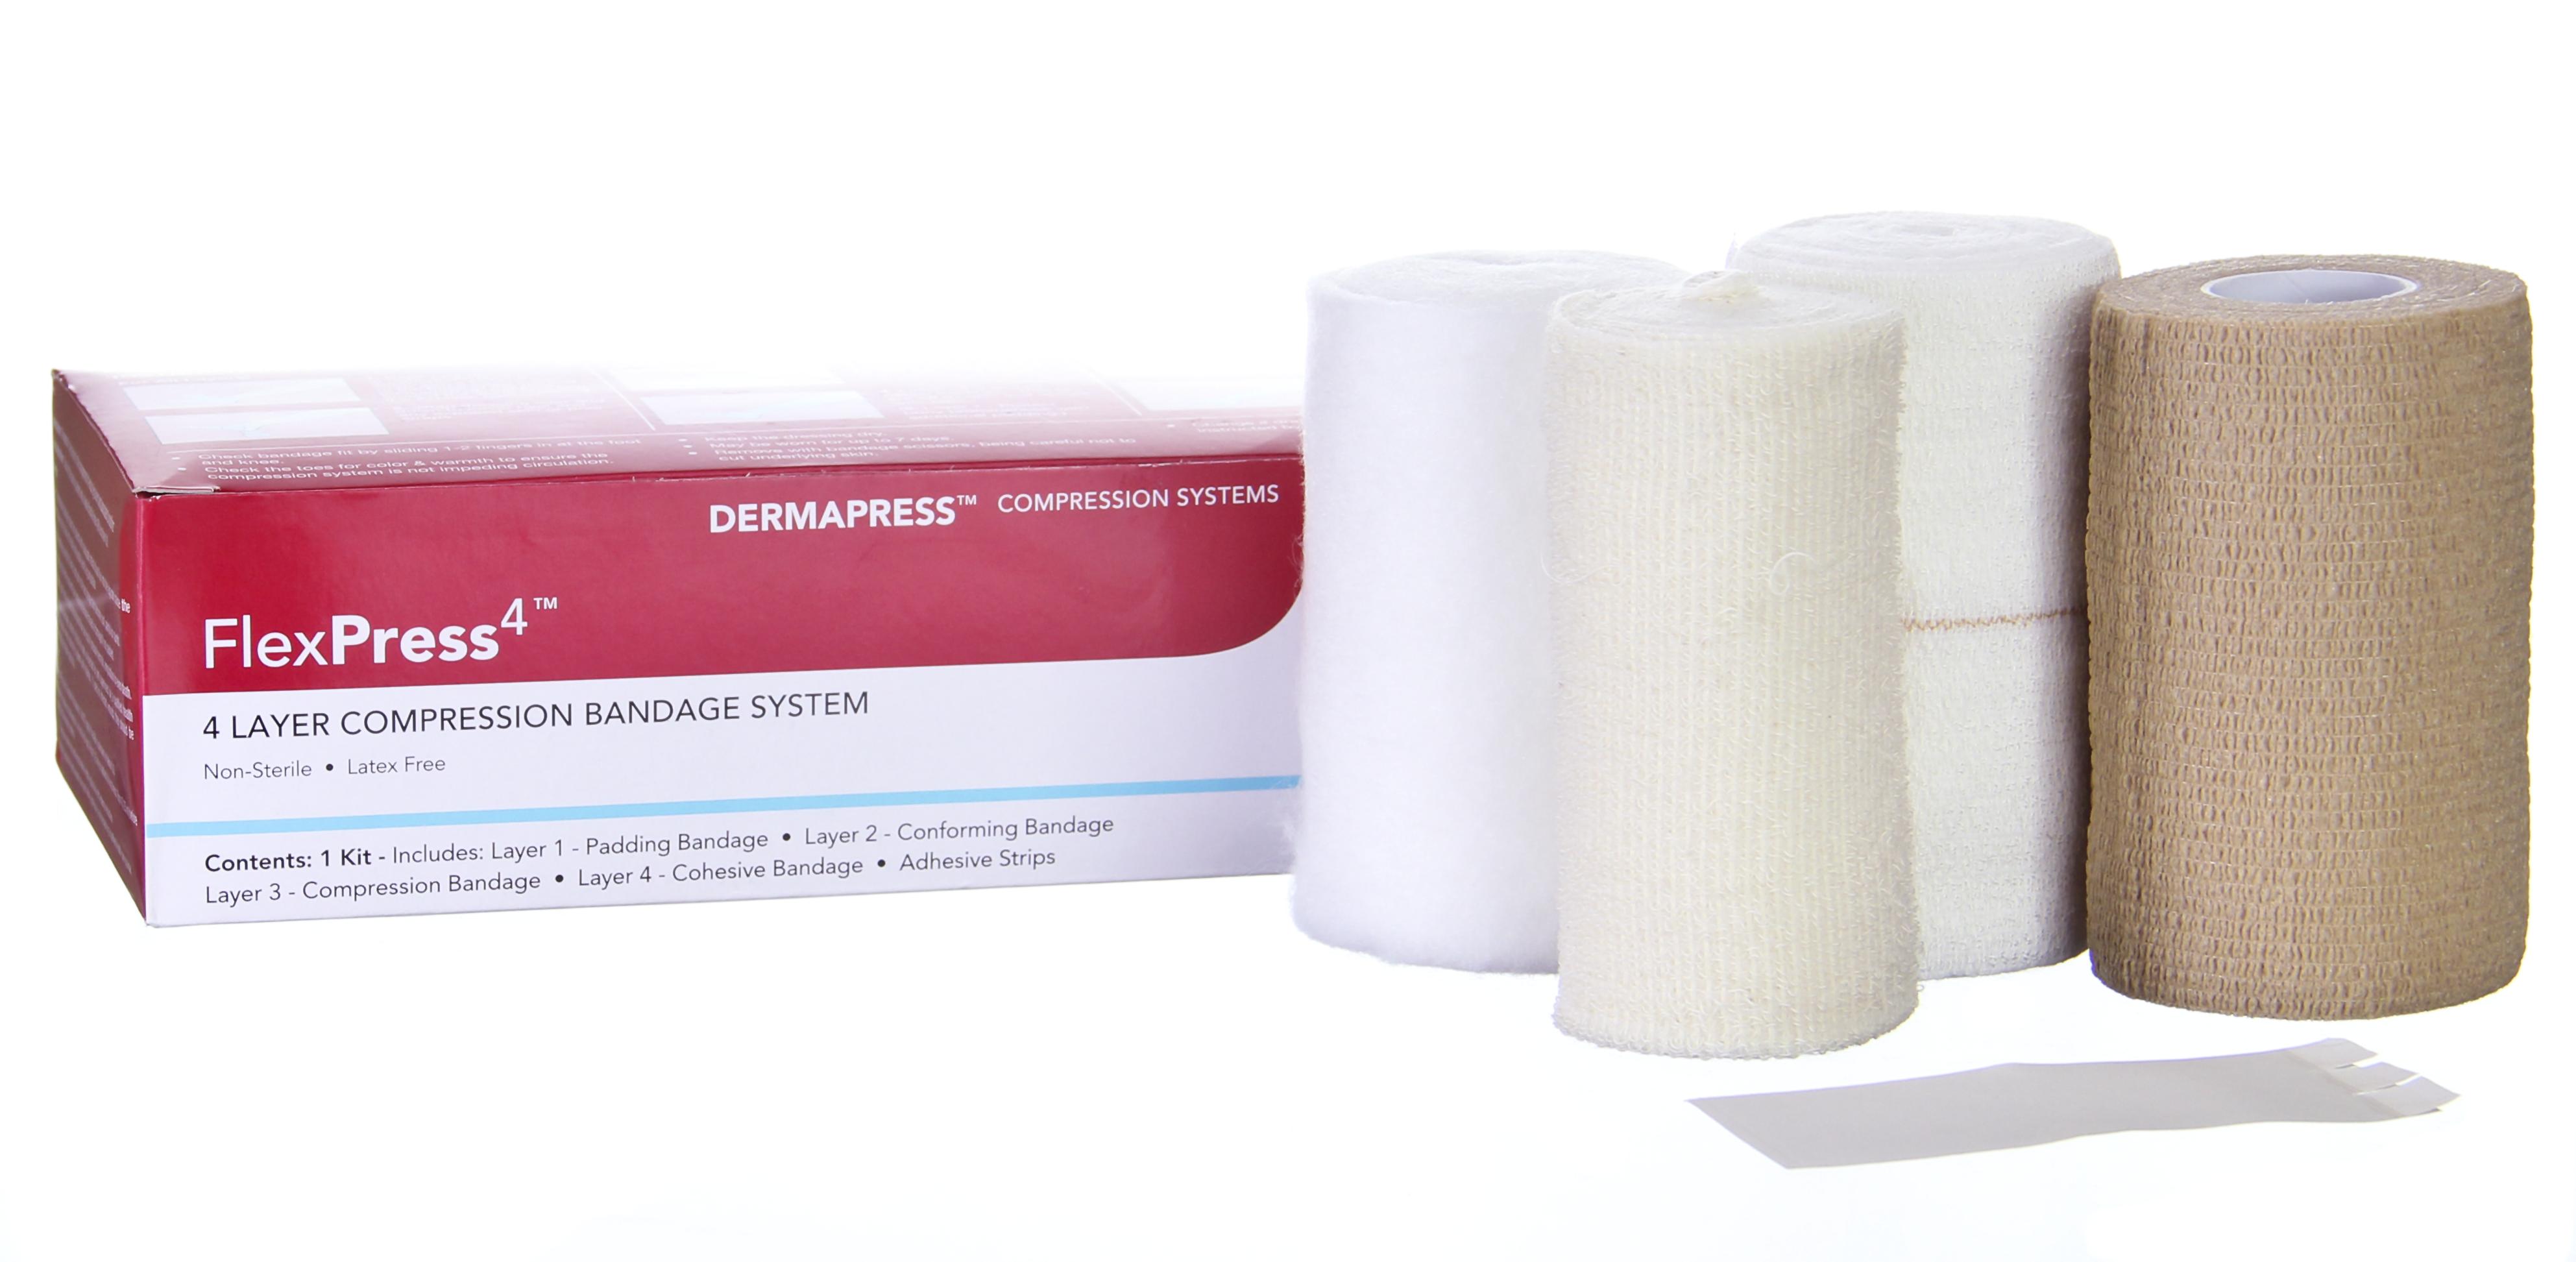 FlexPress4, 4 Layer Compression Bandage System, Standard Compression Tape, NonSterile